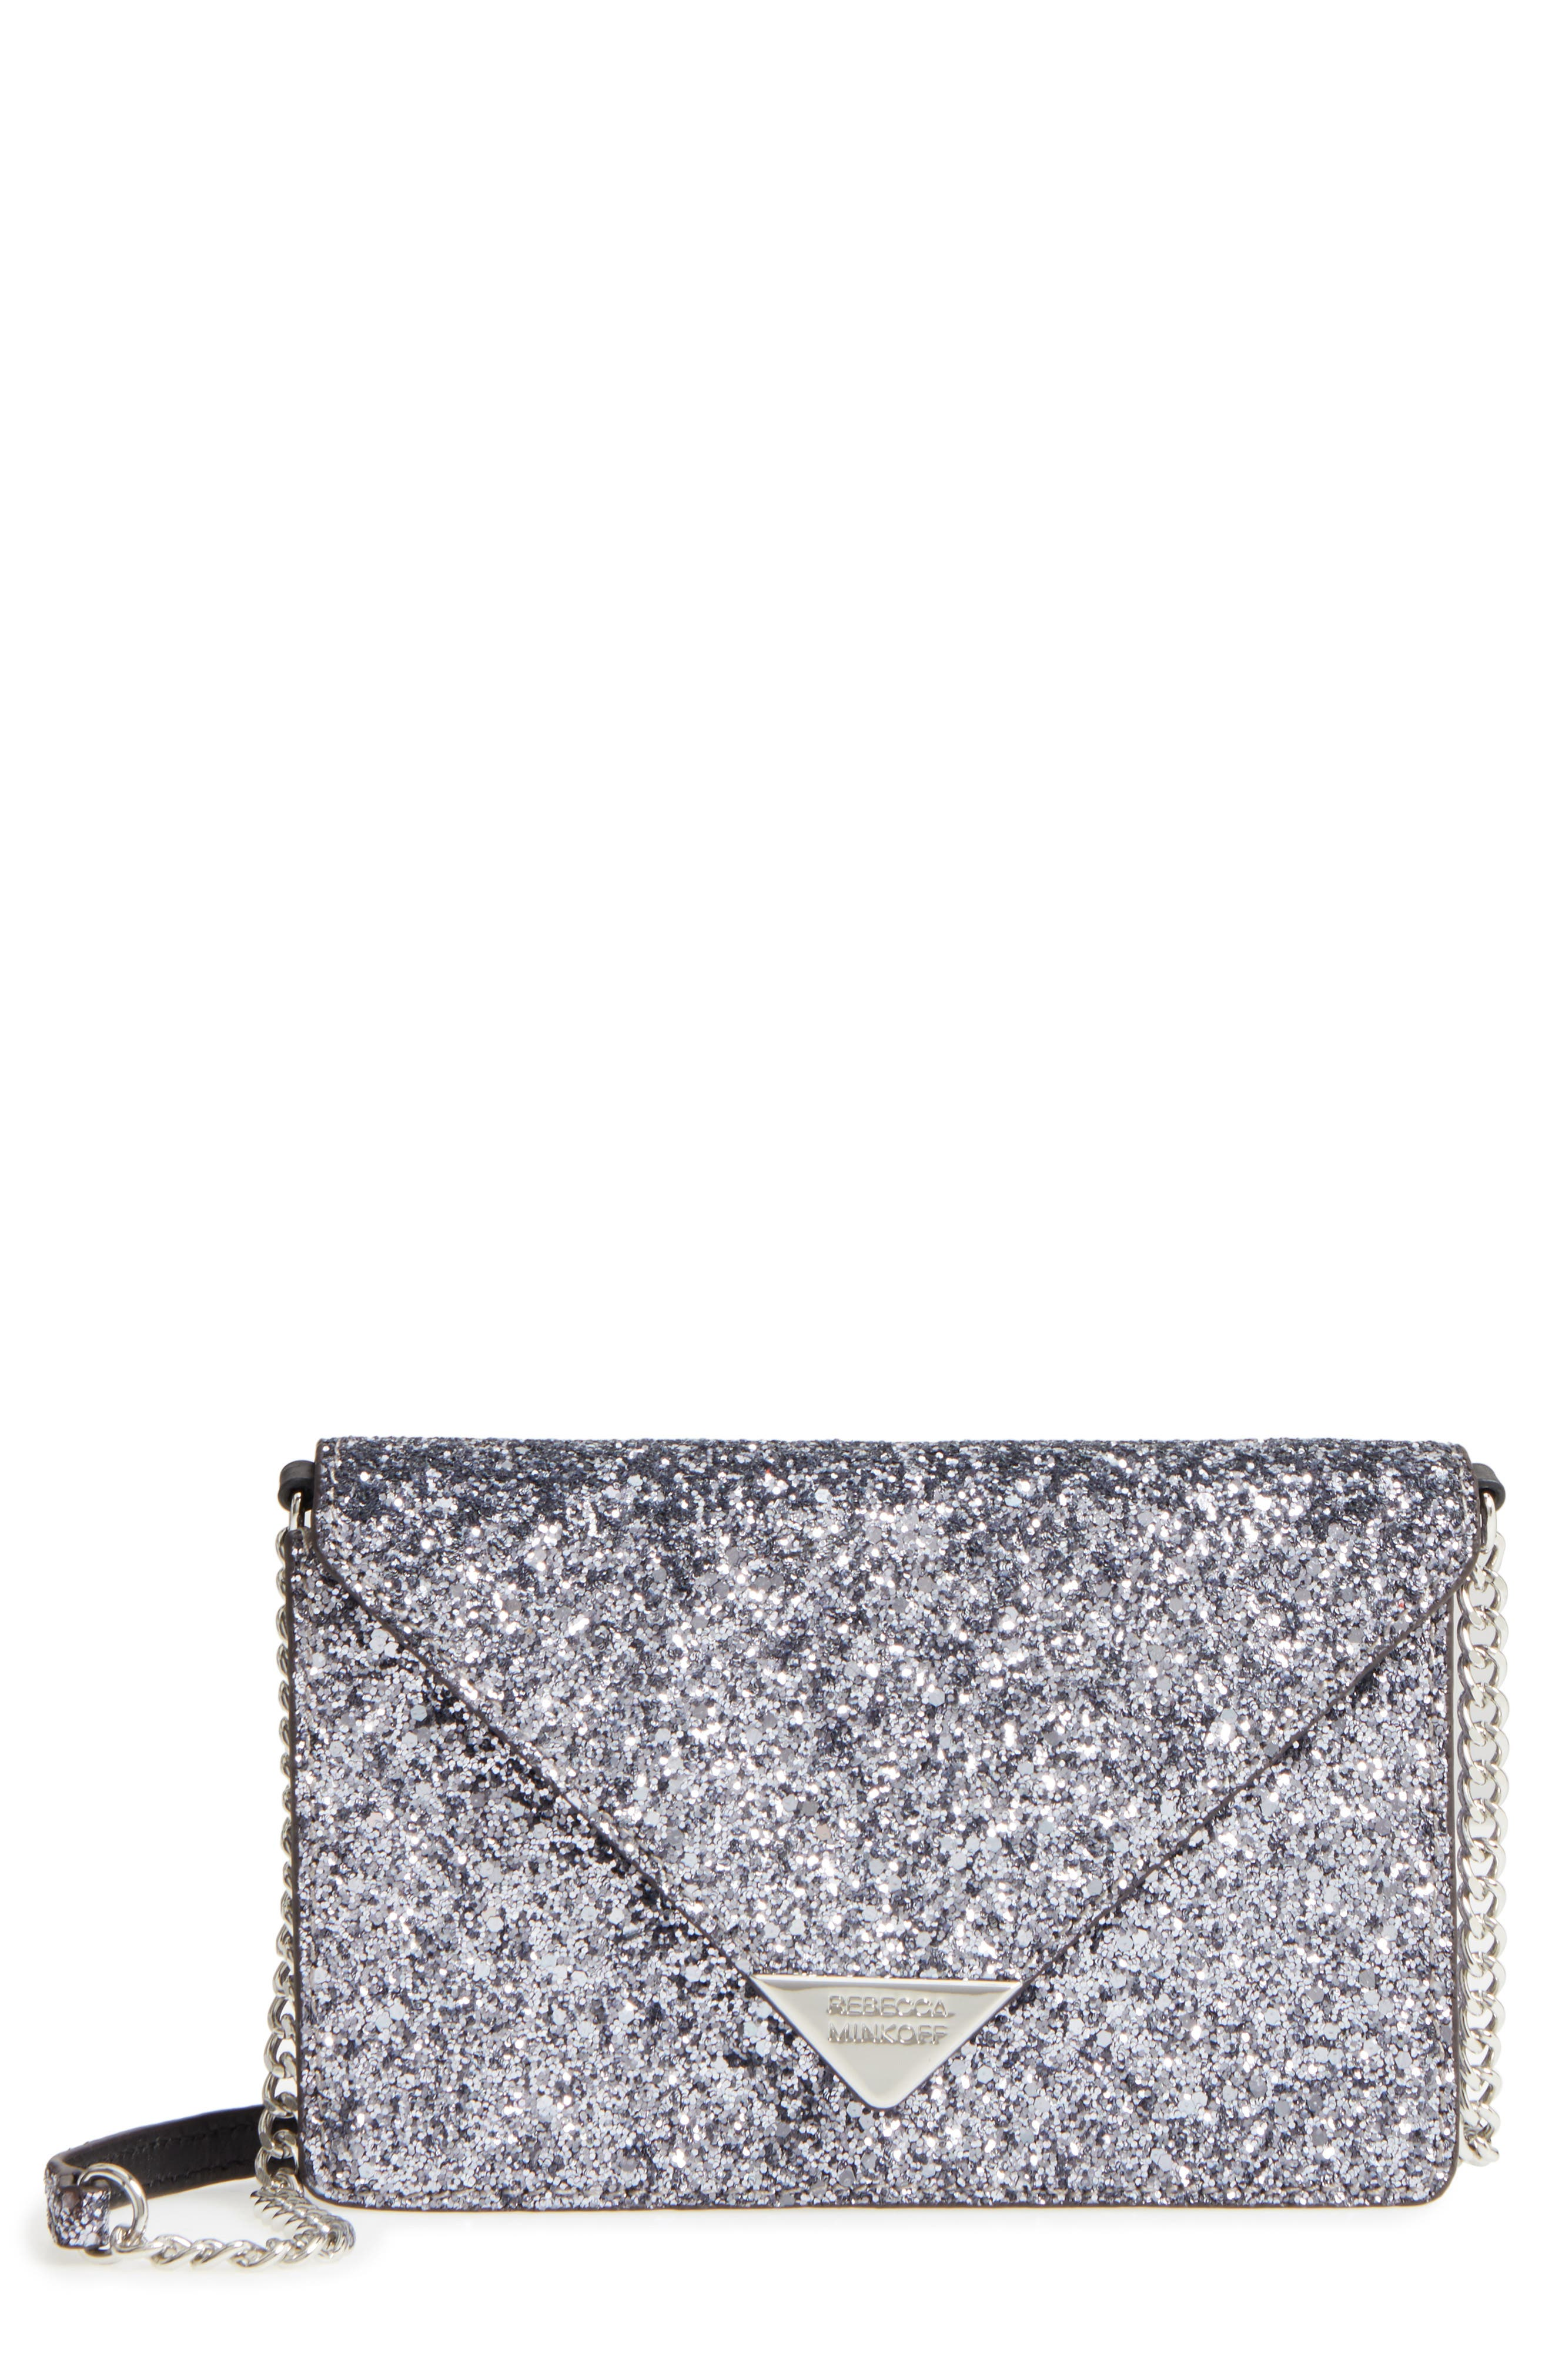 Rebecca Minkoff Molly Crossbody Bag